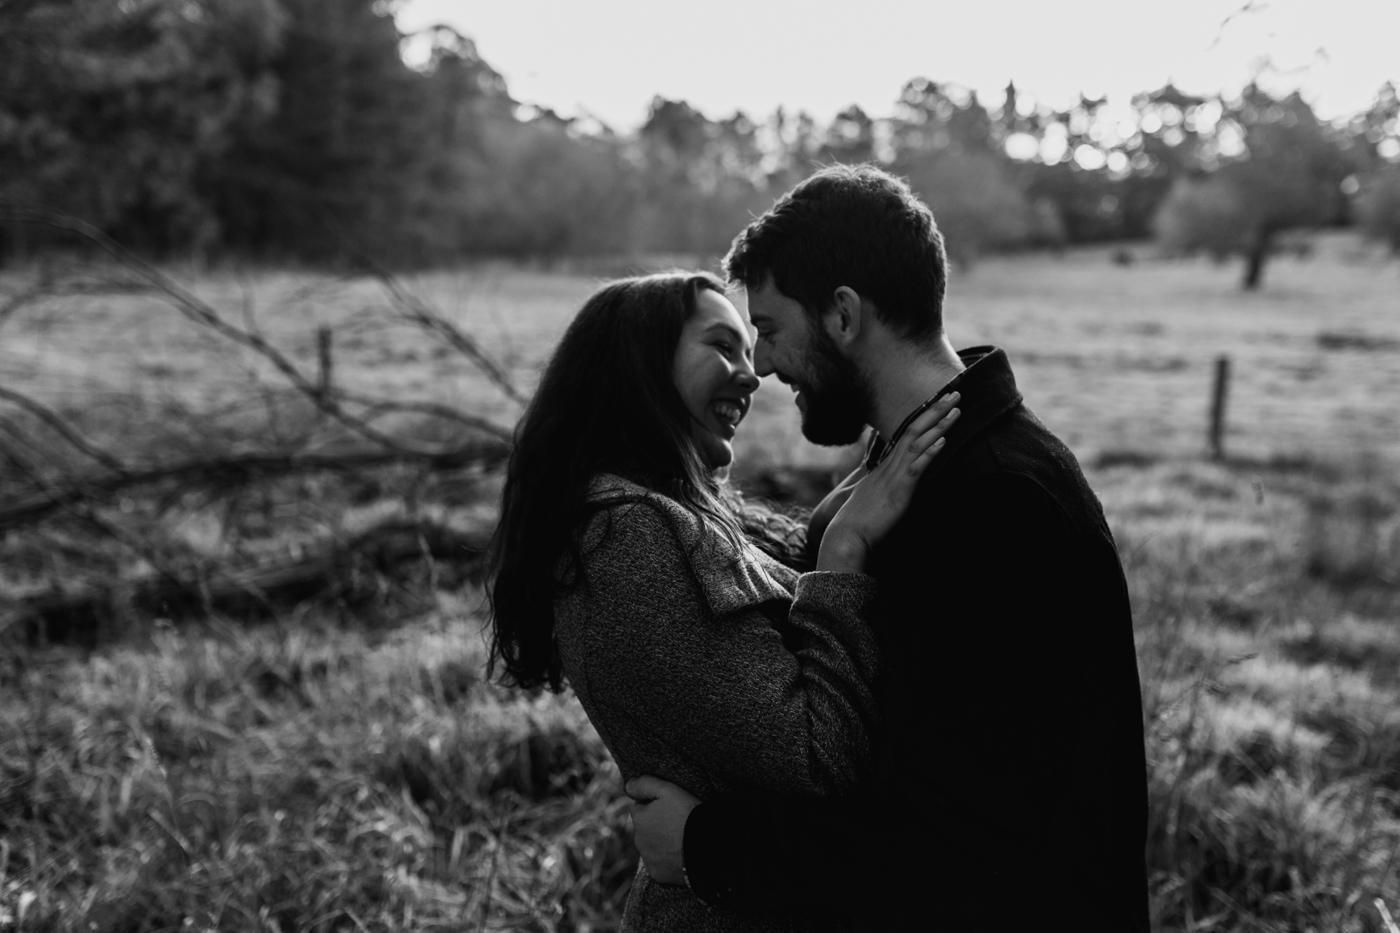 Kate & Kieran - Southern Highlands Engagement - Samantha Heather Photography-85.jpg